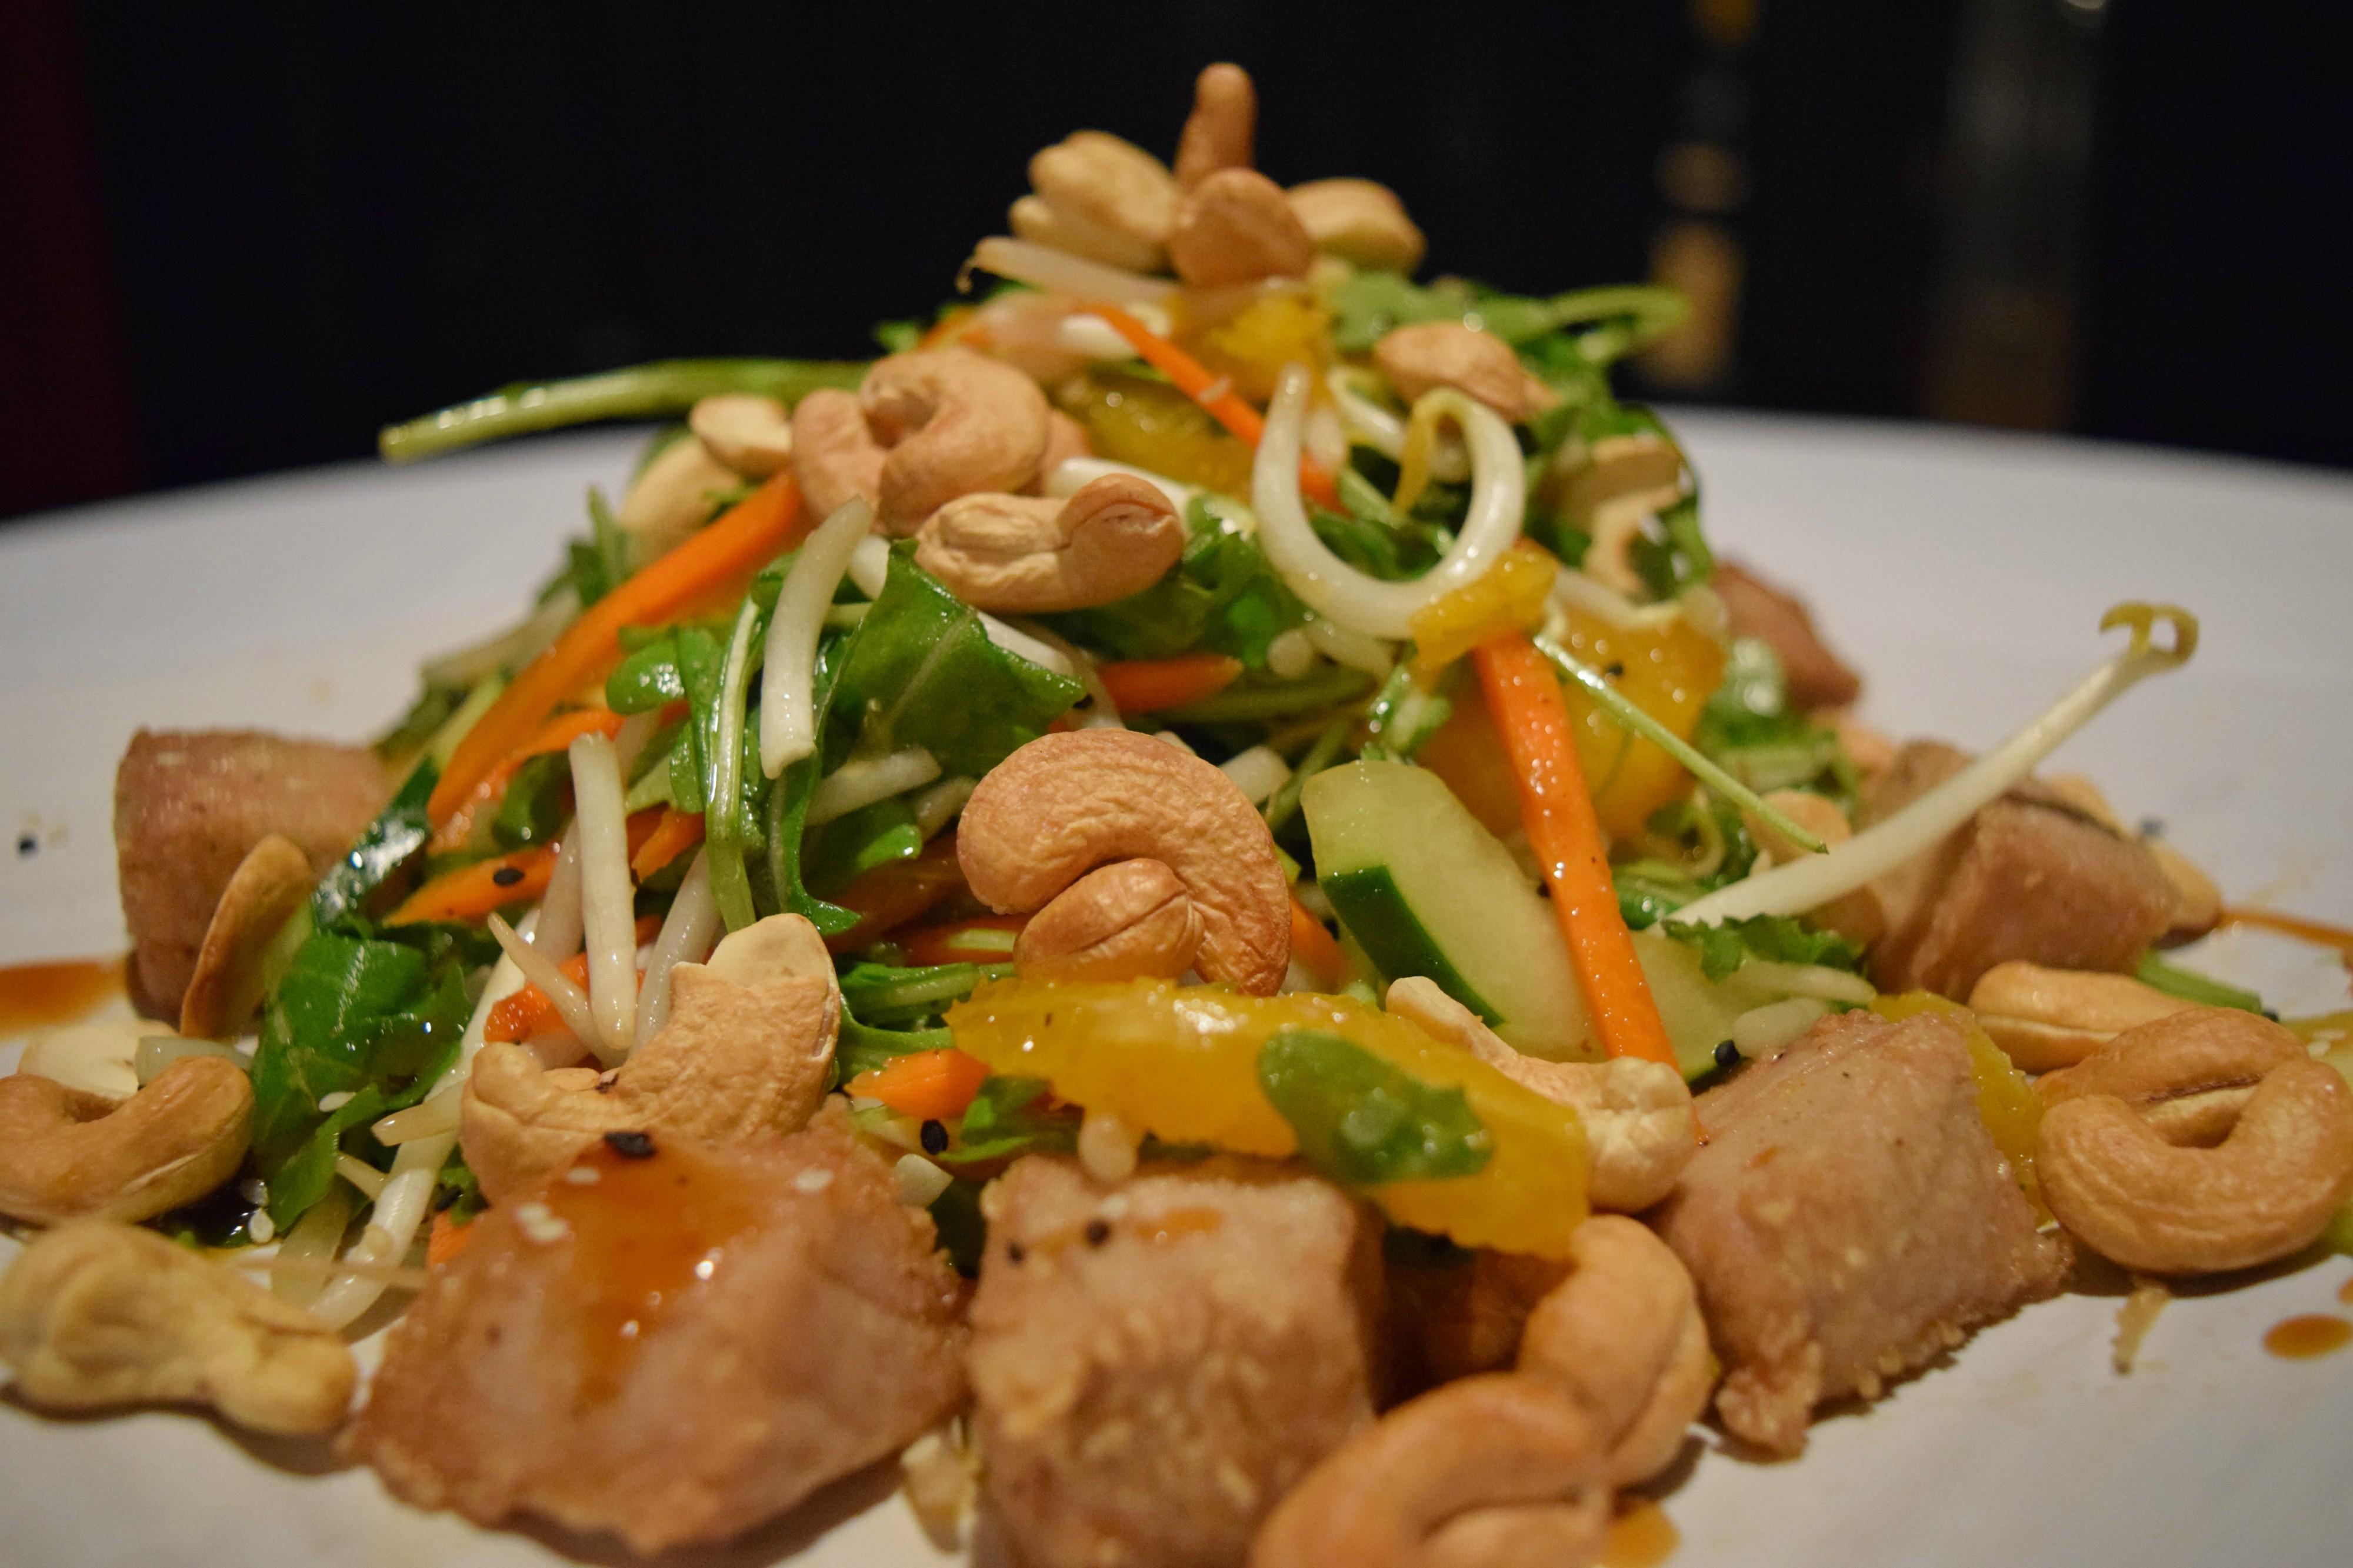 Asian Tuna Salad Kaseys Kitchen And Cocktails